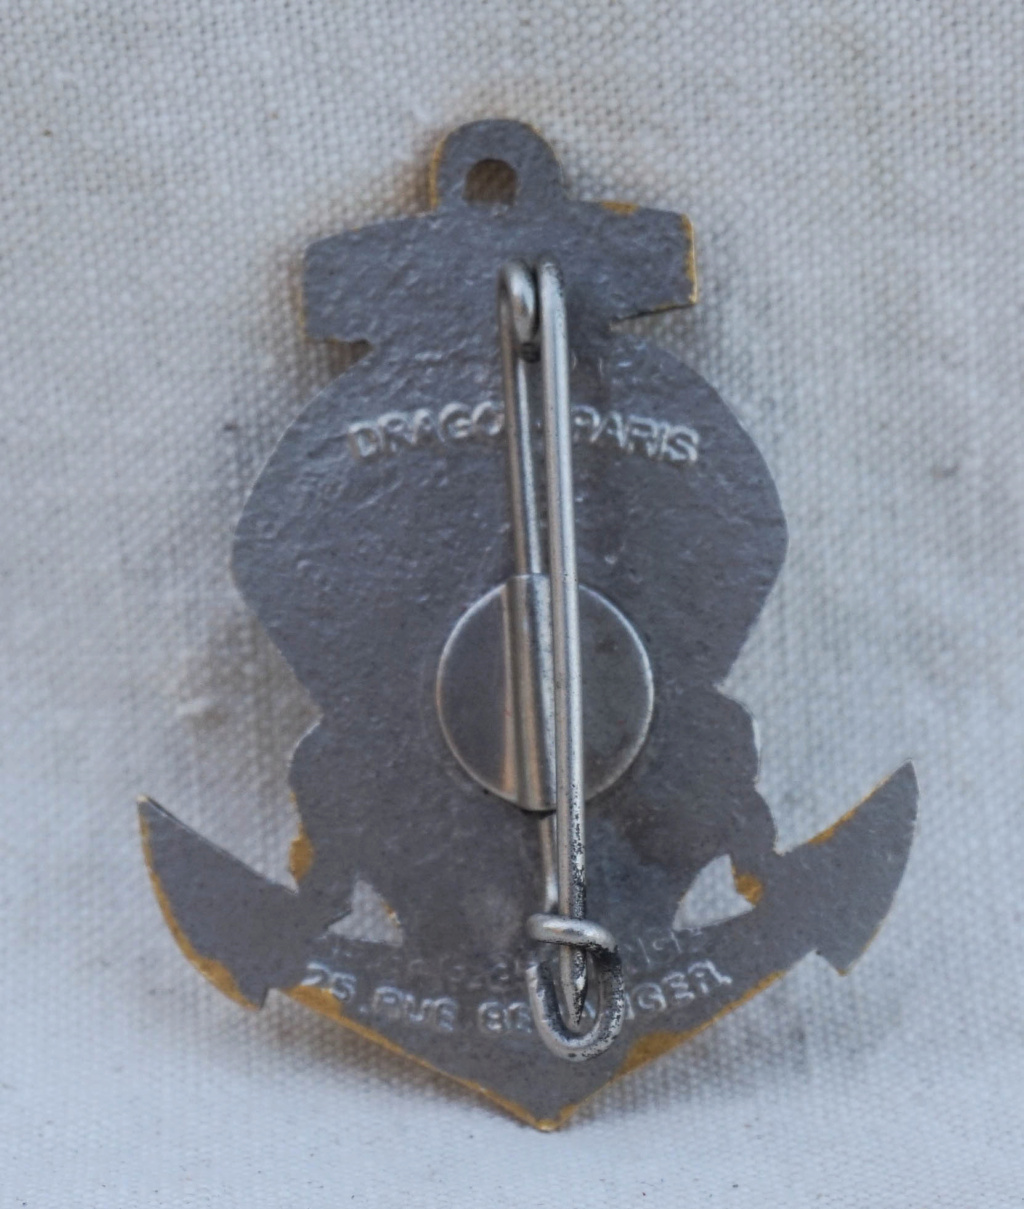 Insigne 6ème BCCP Parachutiste Indochine Drago Paris Nice 25 rue de Beranger - Page 2 1bccp210